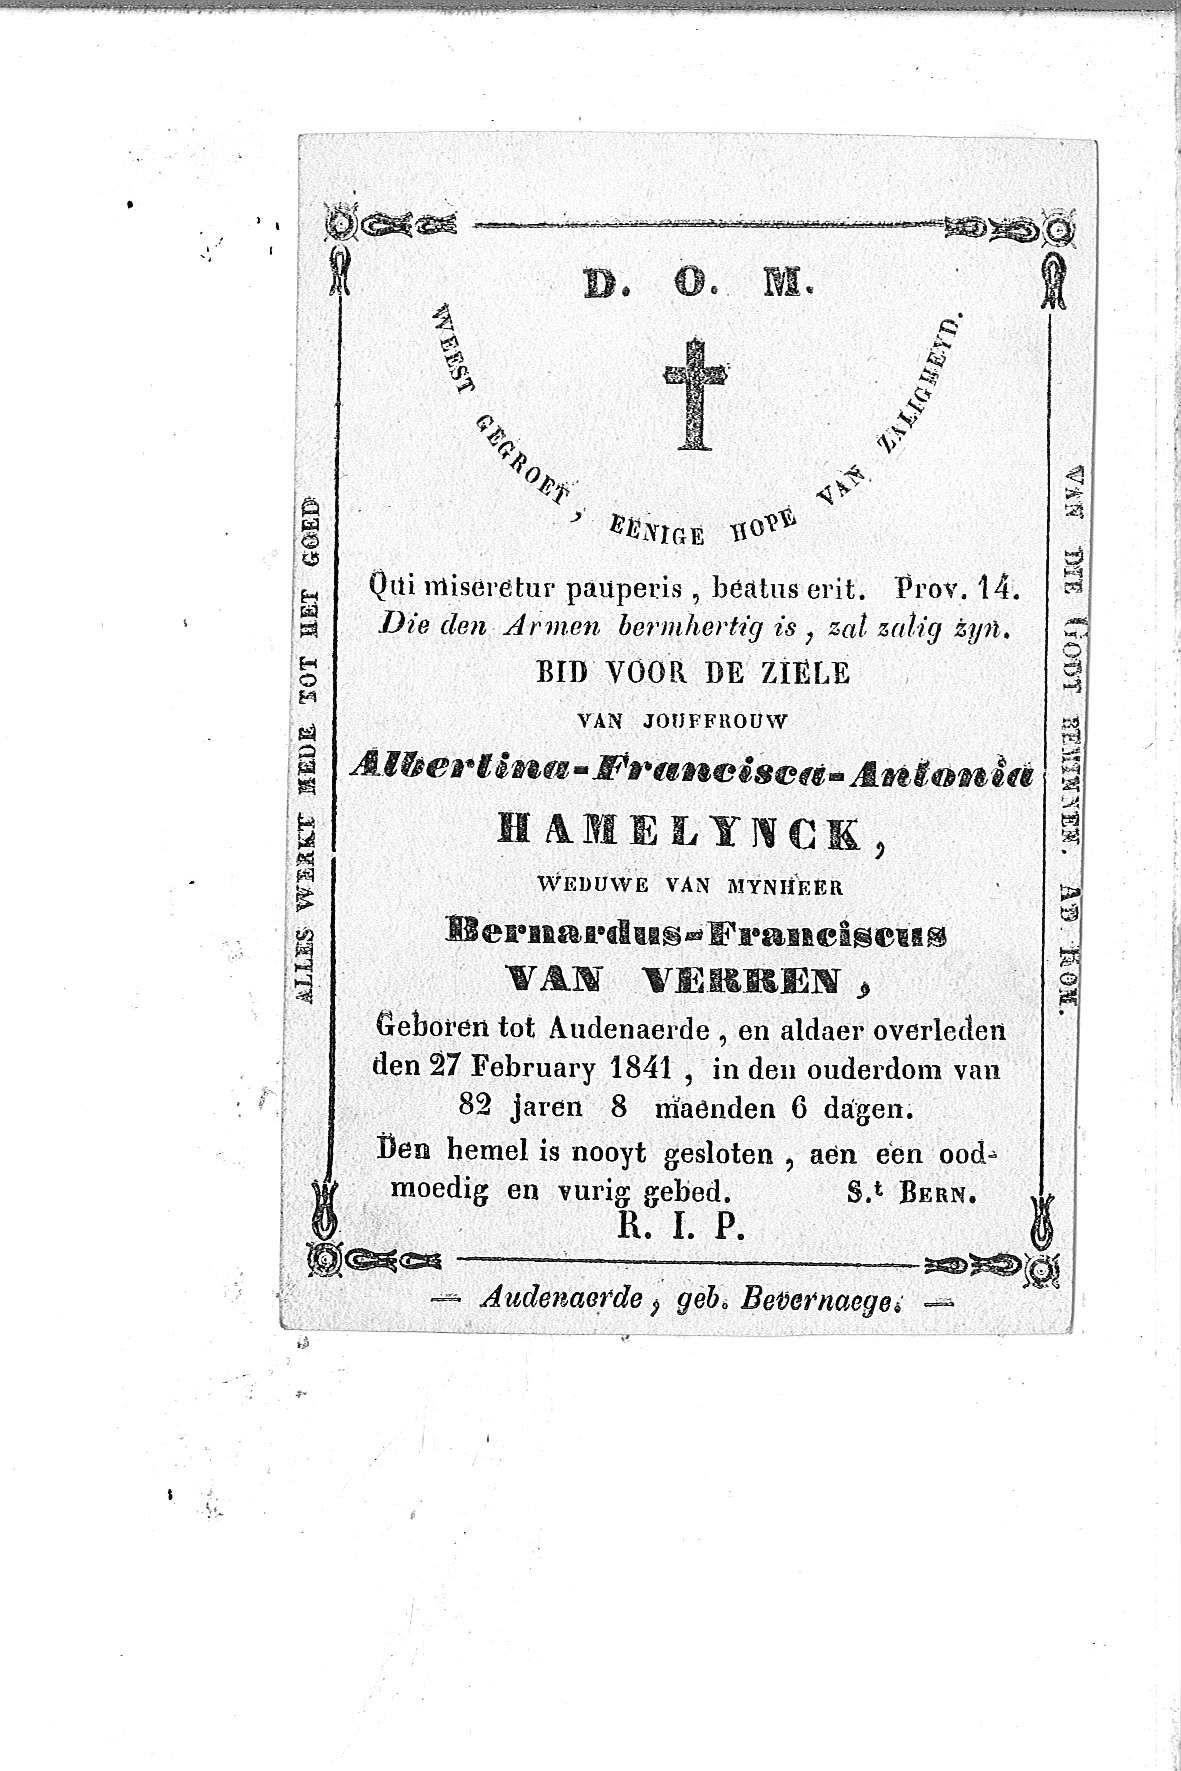 Albertina-Francisca-Antonia-(1841)-20121011095319_00029.jpg